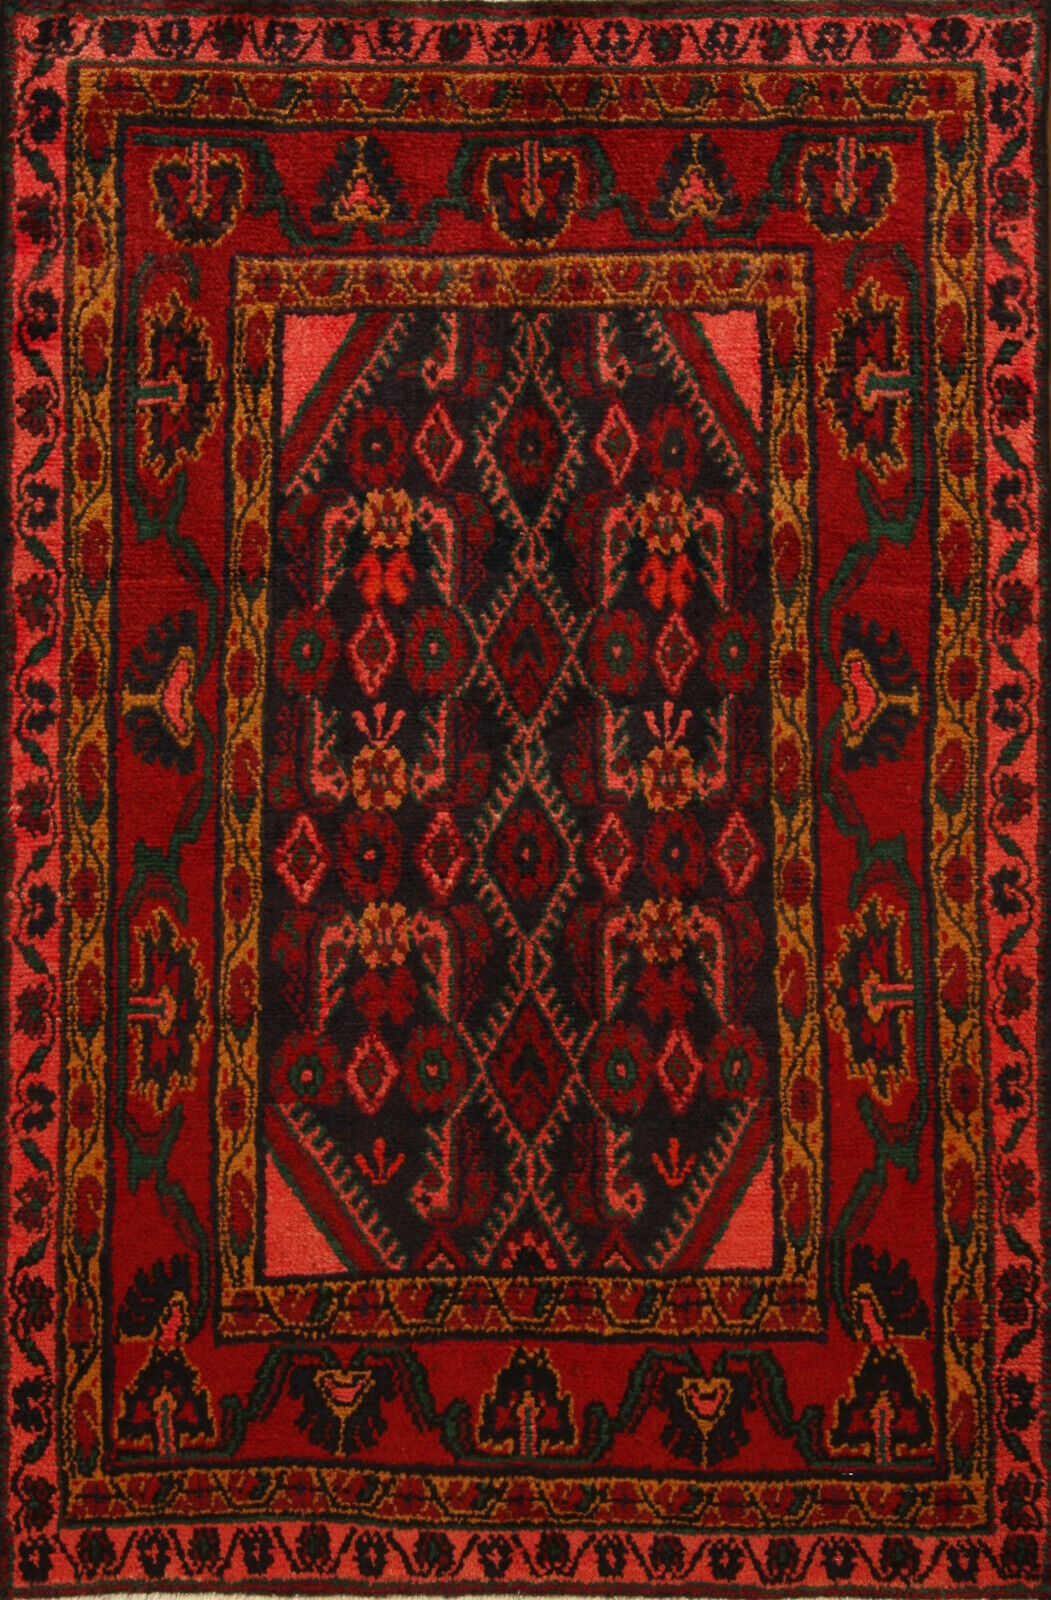 TAPPETO Orientale Vero Annodato Tapis persan n. 4601 (147 x 98) cm